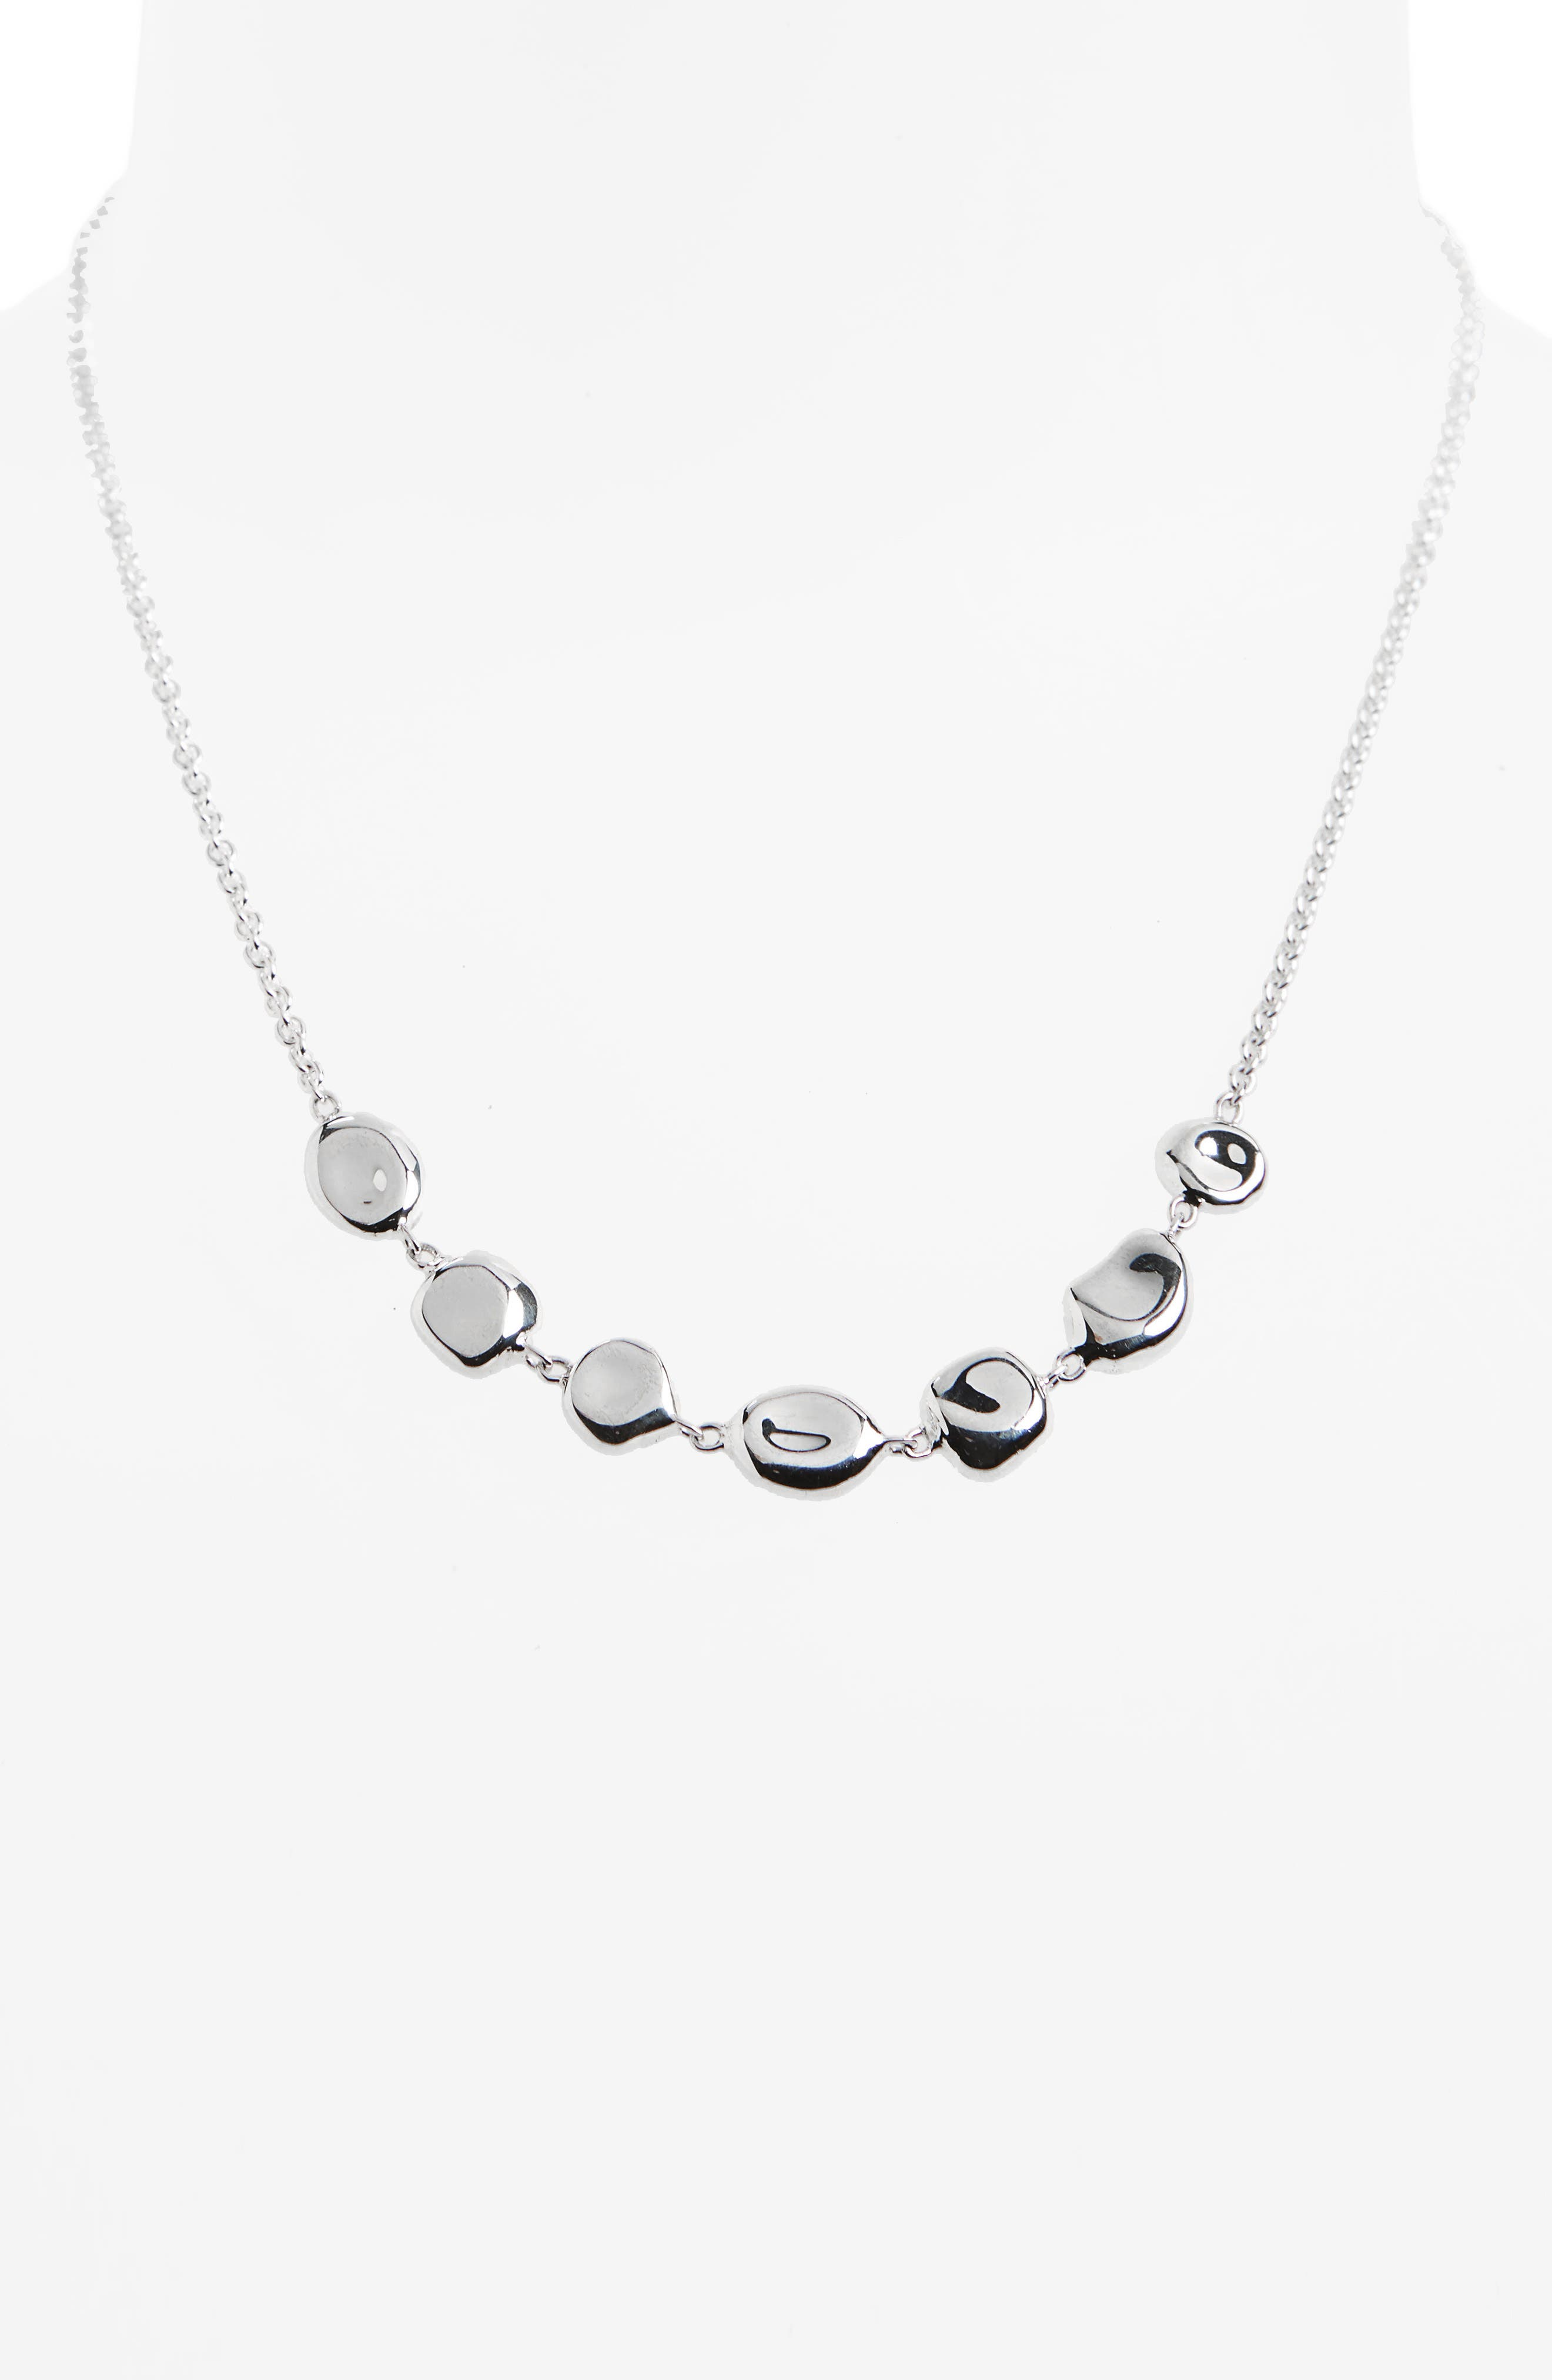 Onda Collar Necklace,                         Main,                         color, Silver